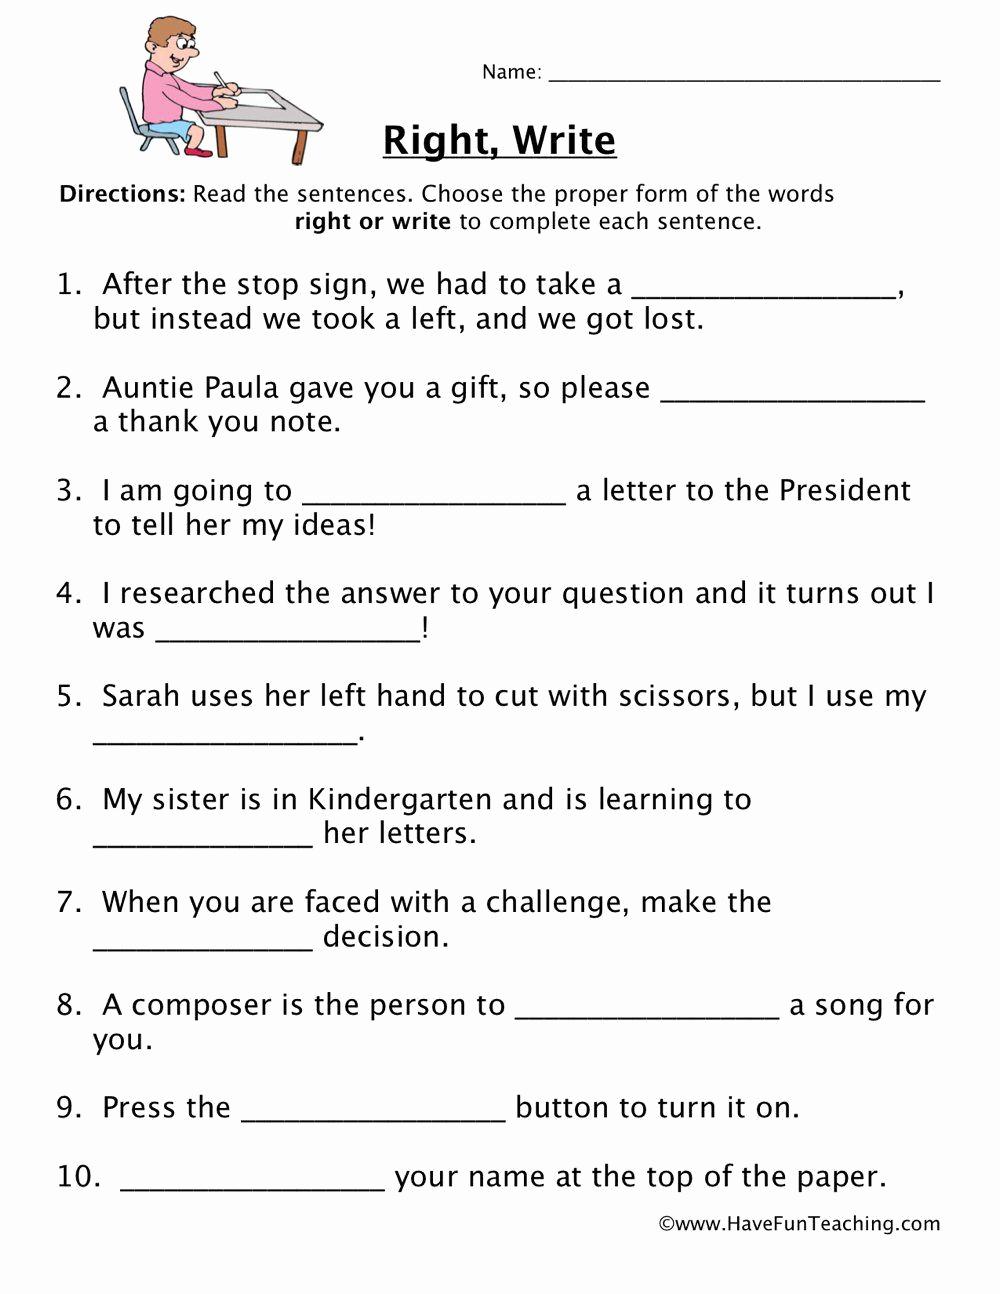 Homonym Worksheets Middle School Fresh Homonym Worksheets Middle School – Worksheet From Home